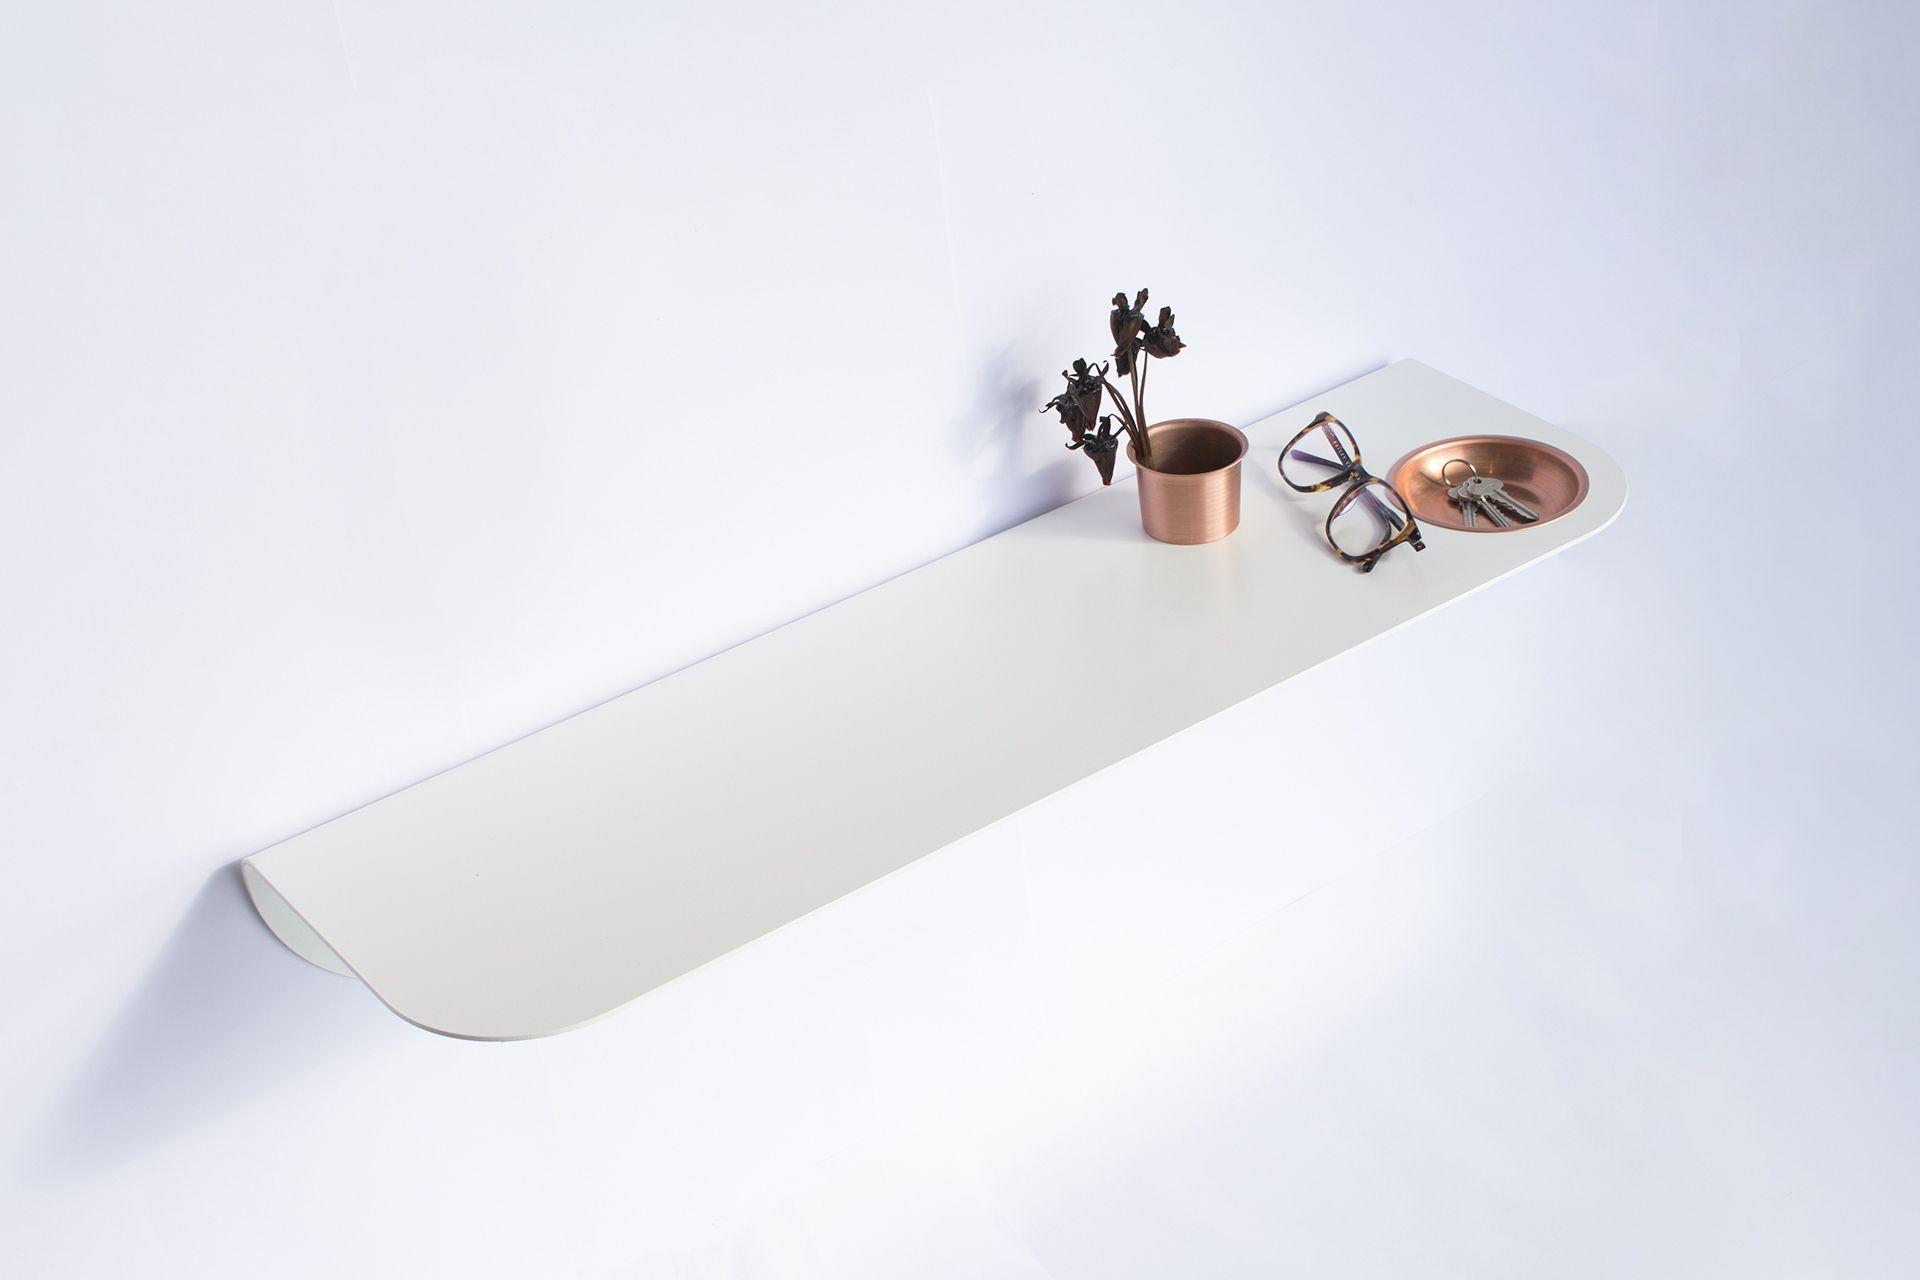 Led Schlafzimmerlampe ~ Curve wall shelf rowan jackman design design pinterest